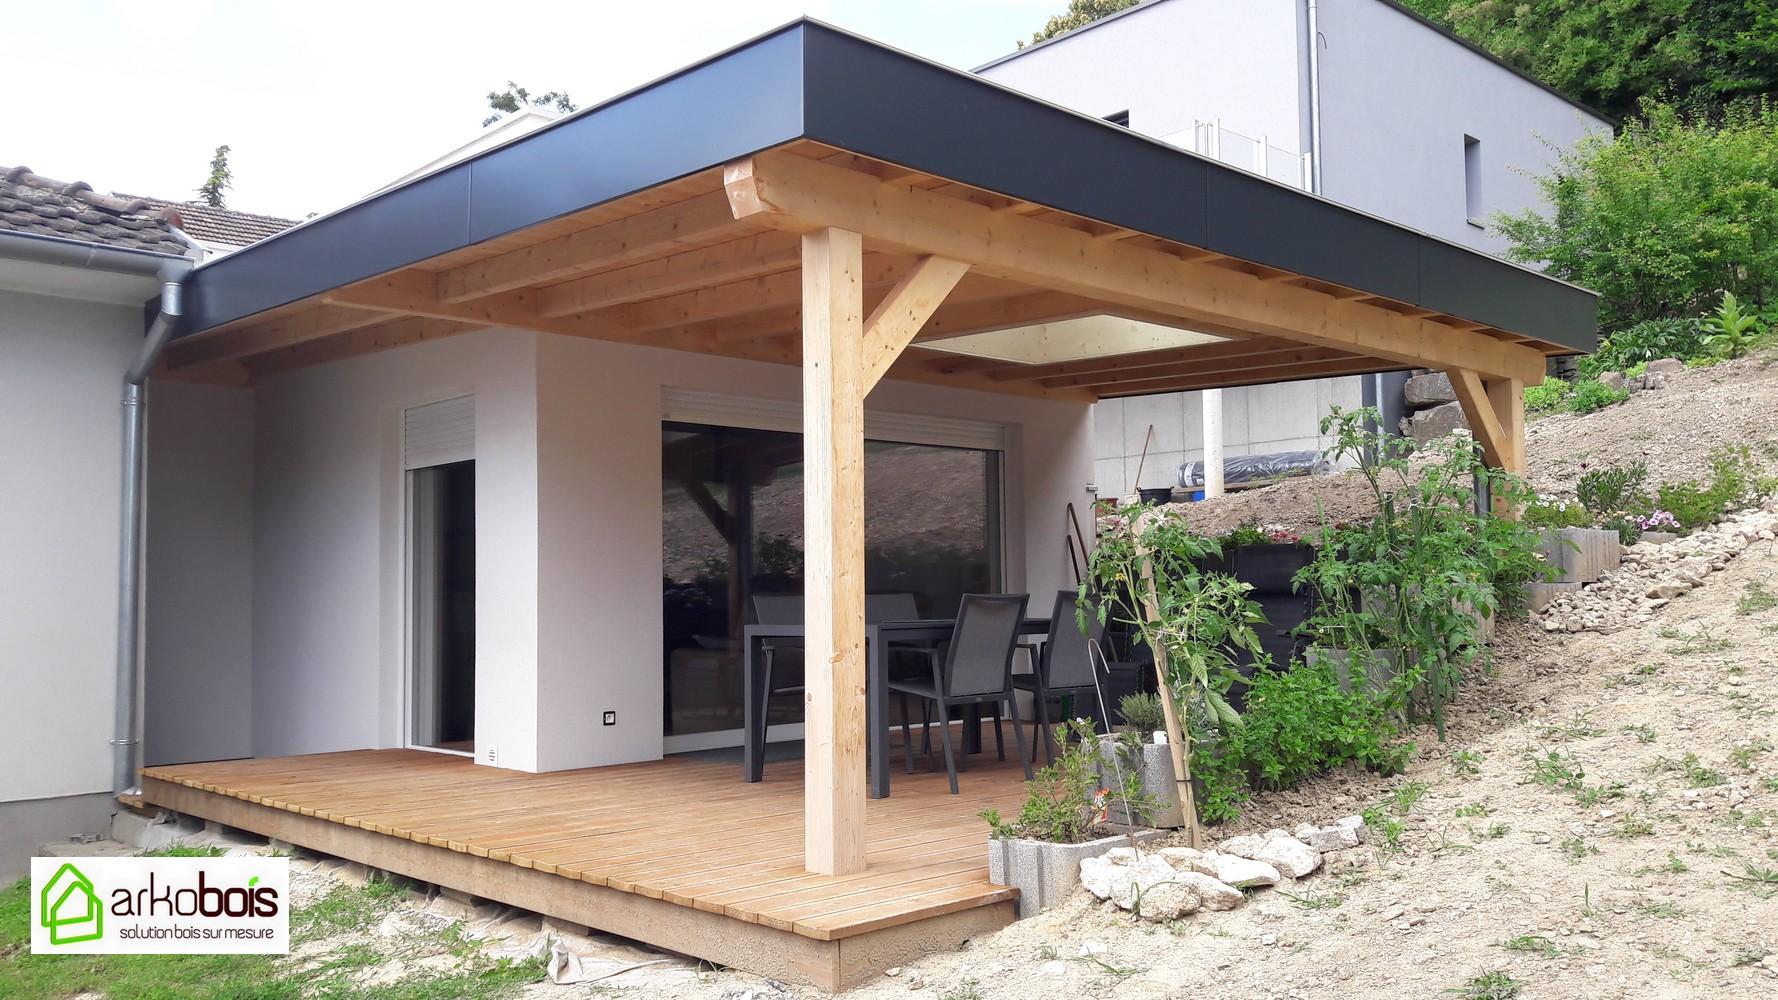 Extension Maison Terrasse Couverte arkobois — véranda et agrandissement - arkobois